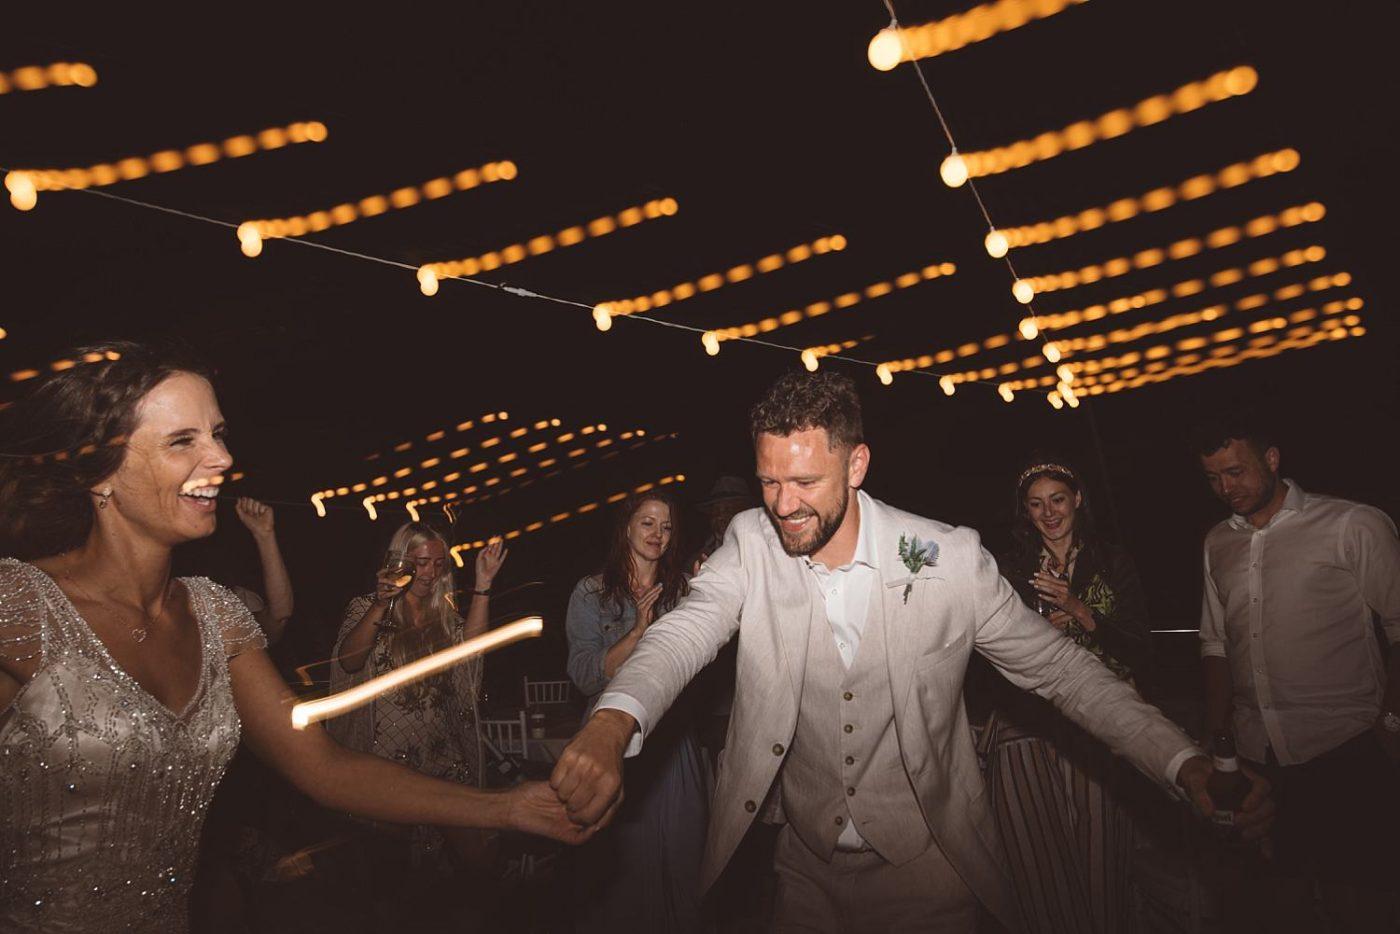 candid wedding photographer Essex